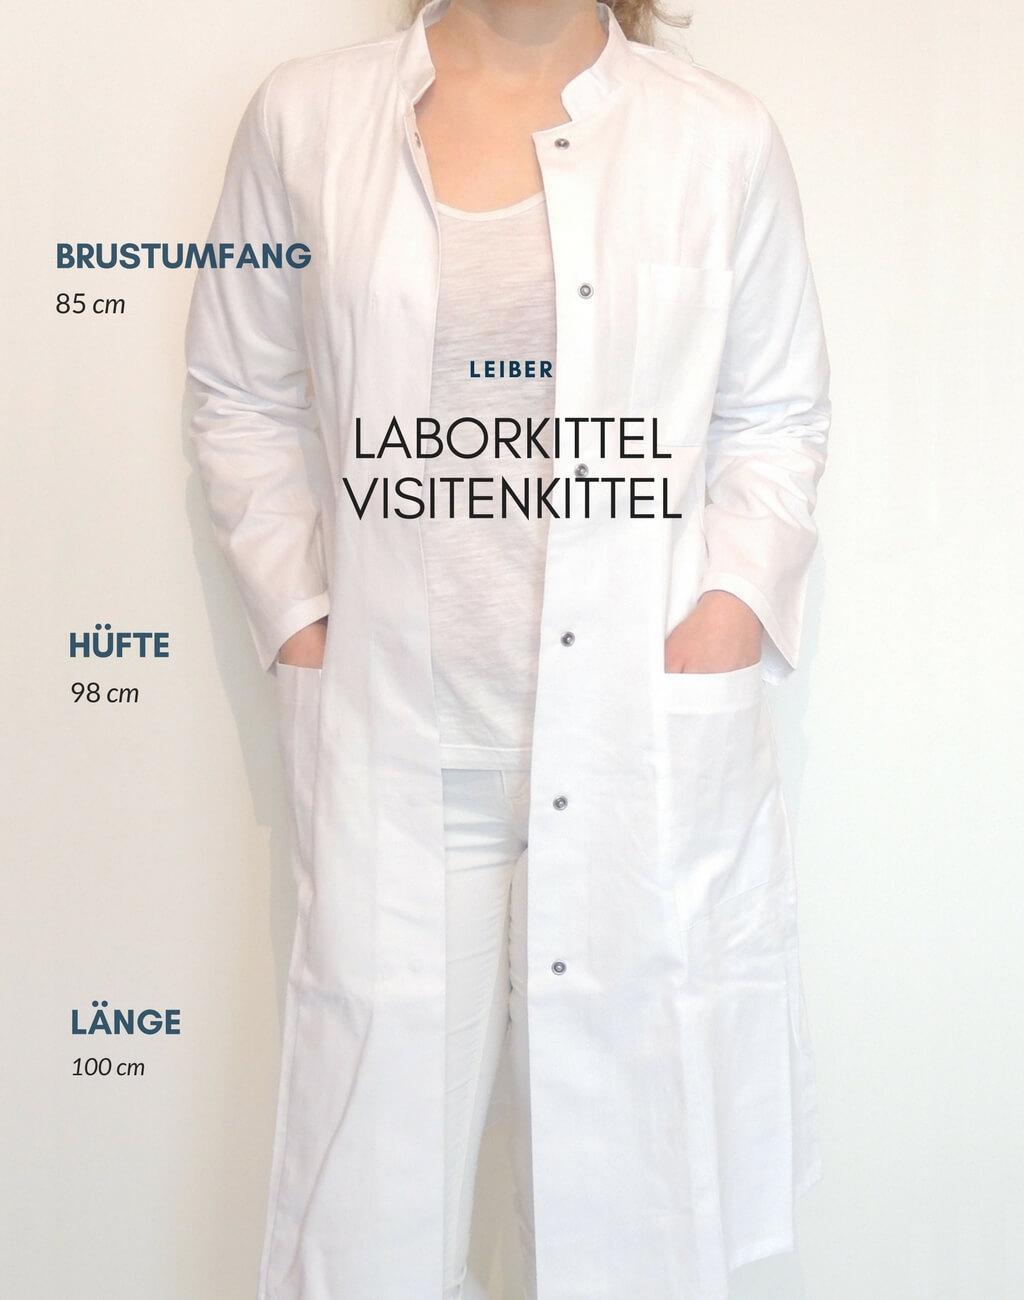 Leiber-Laborkittel-Visitenkittel-weiß-Damen-tailliert-XS